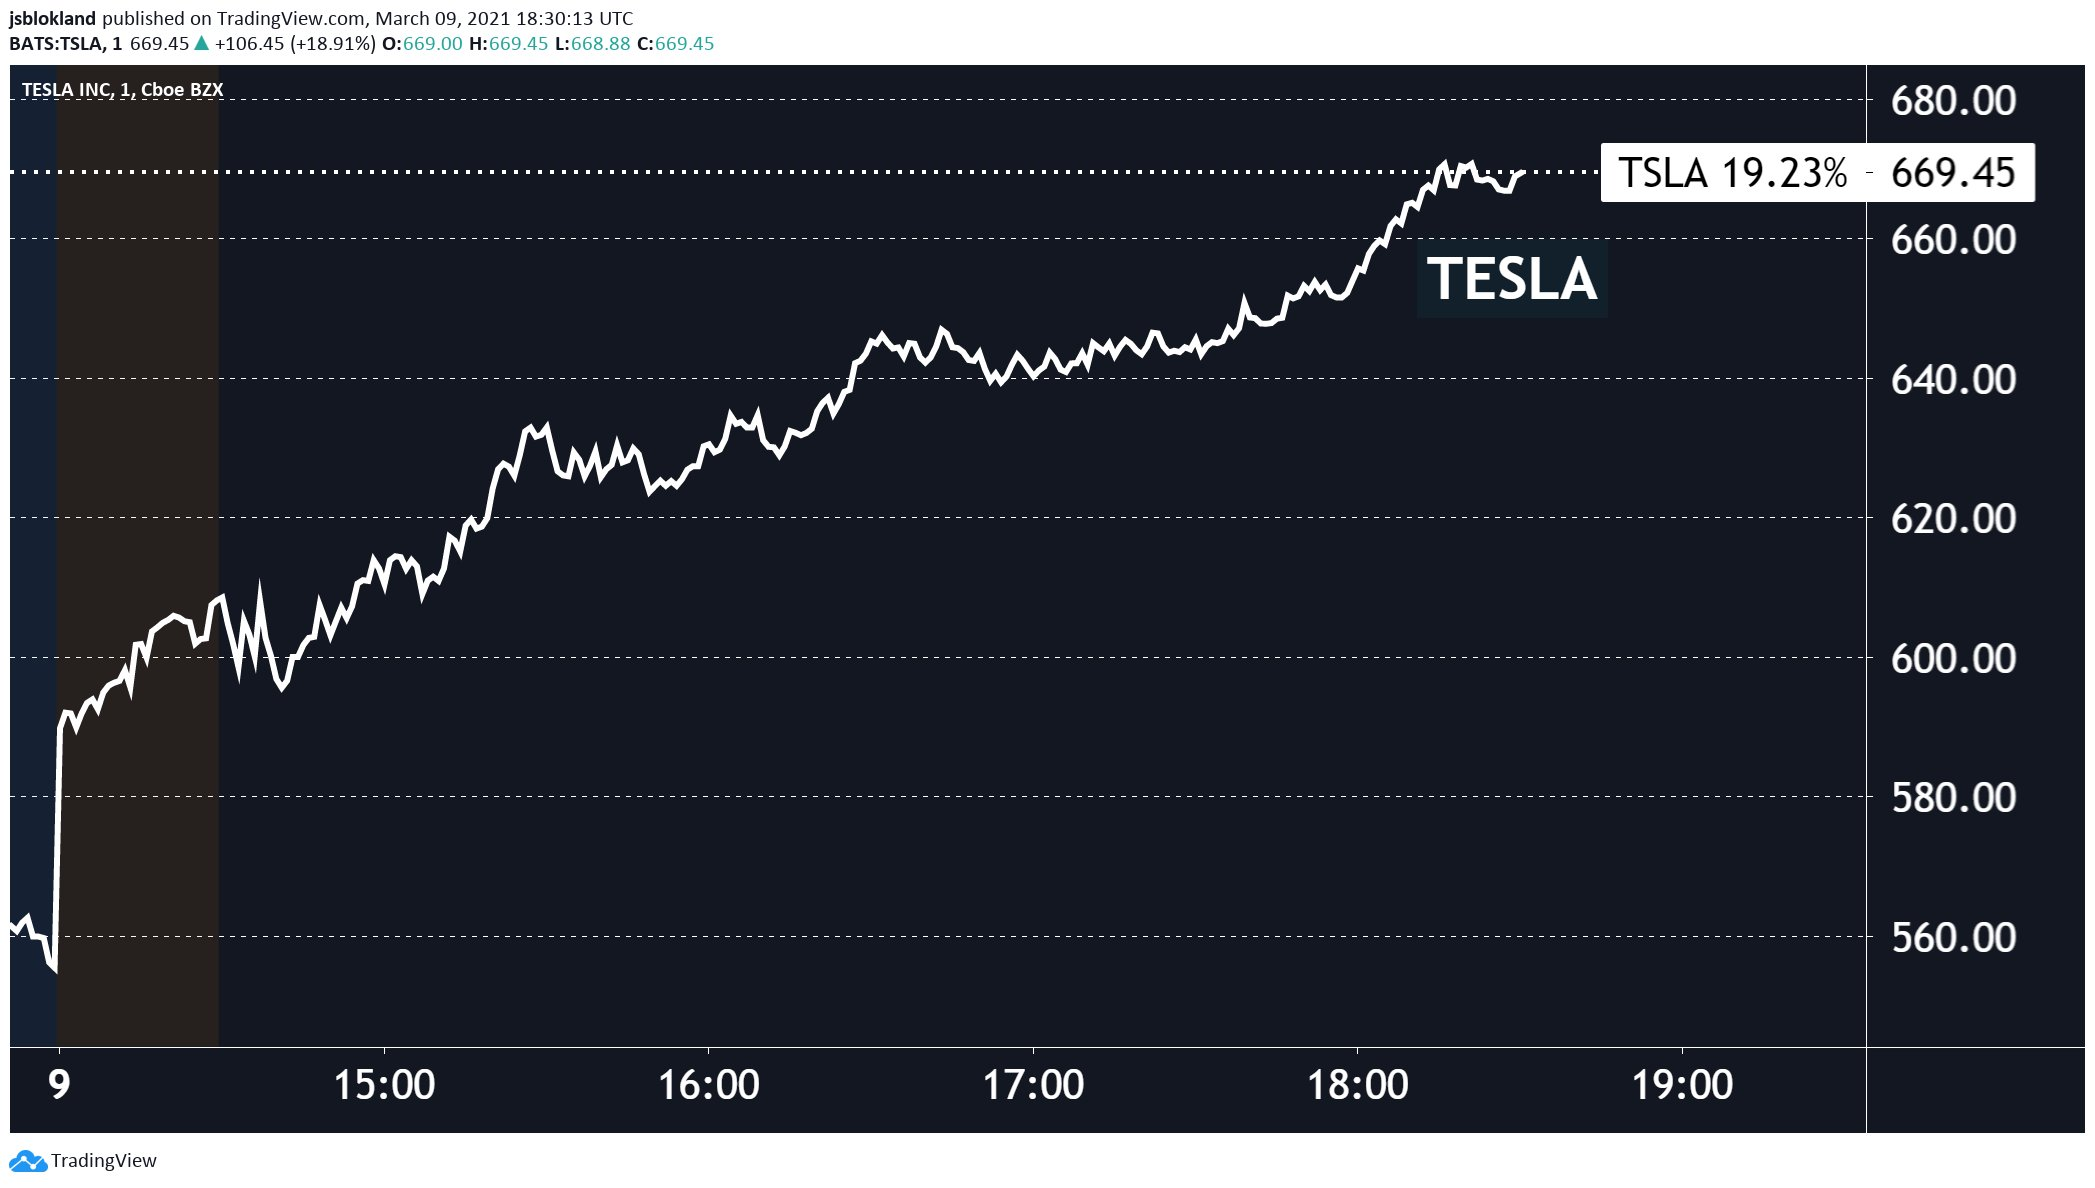 Tesla's stock price up 20% yesterday